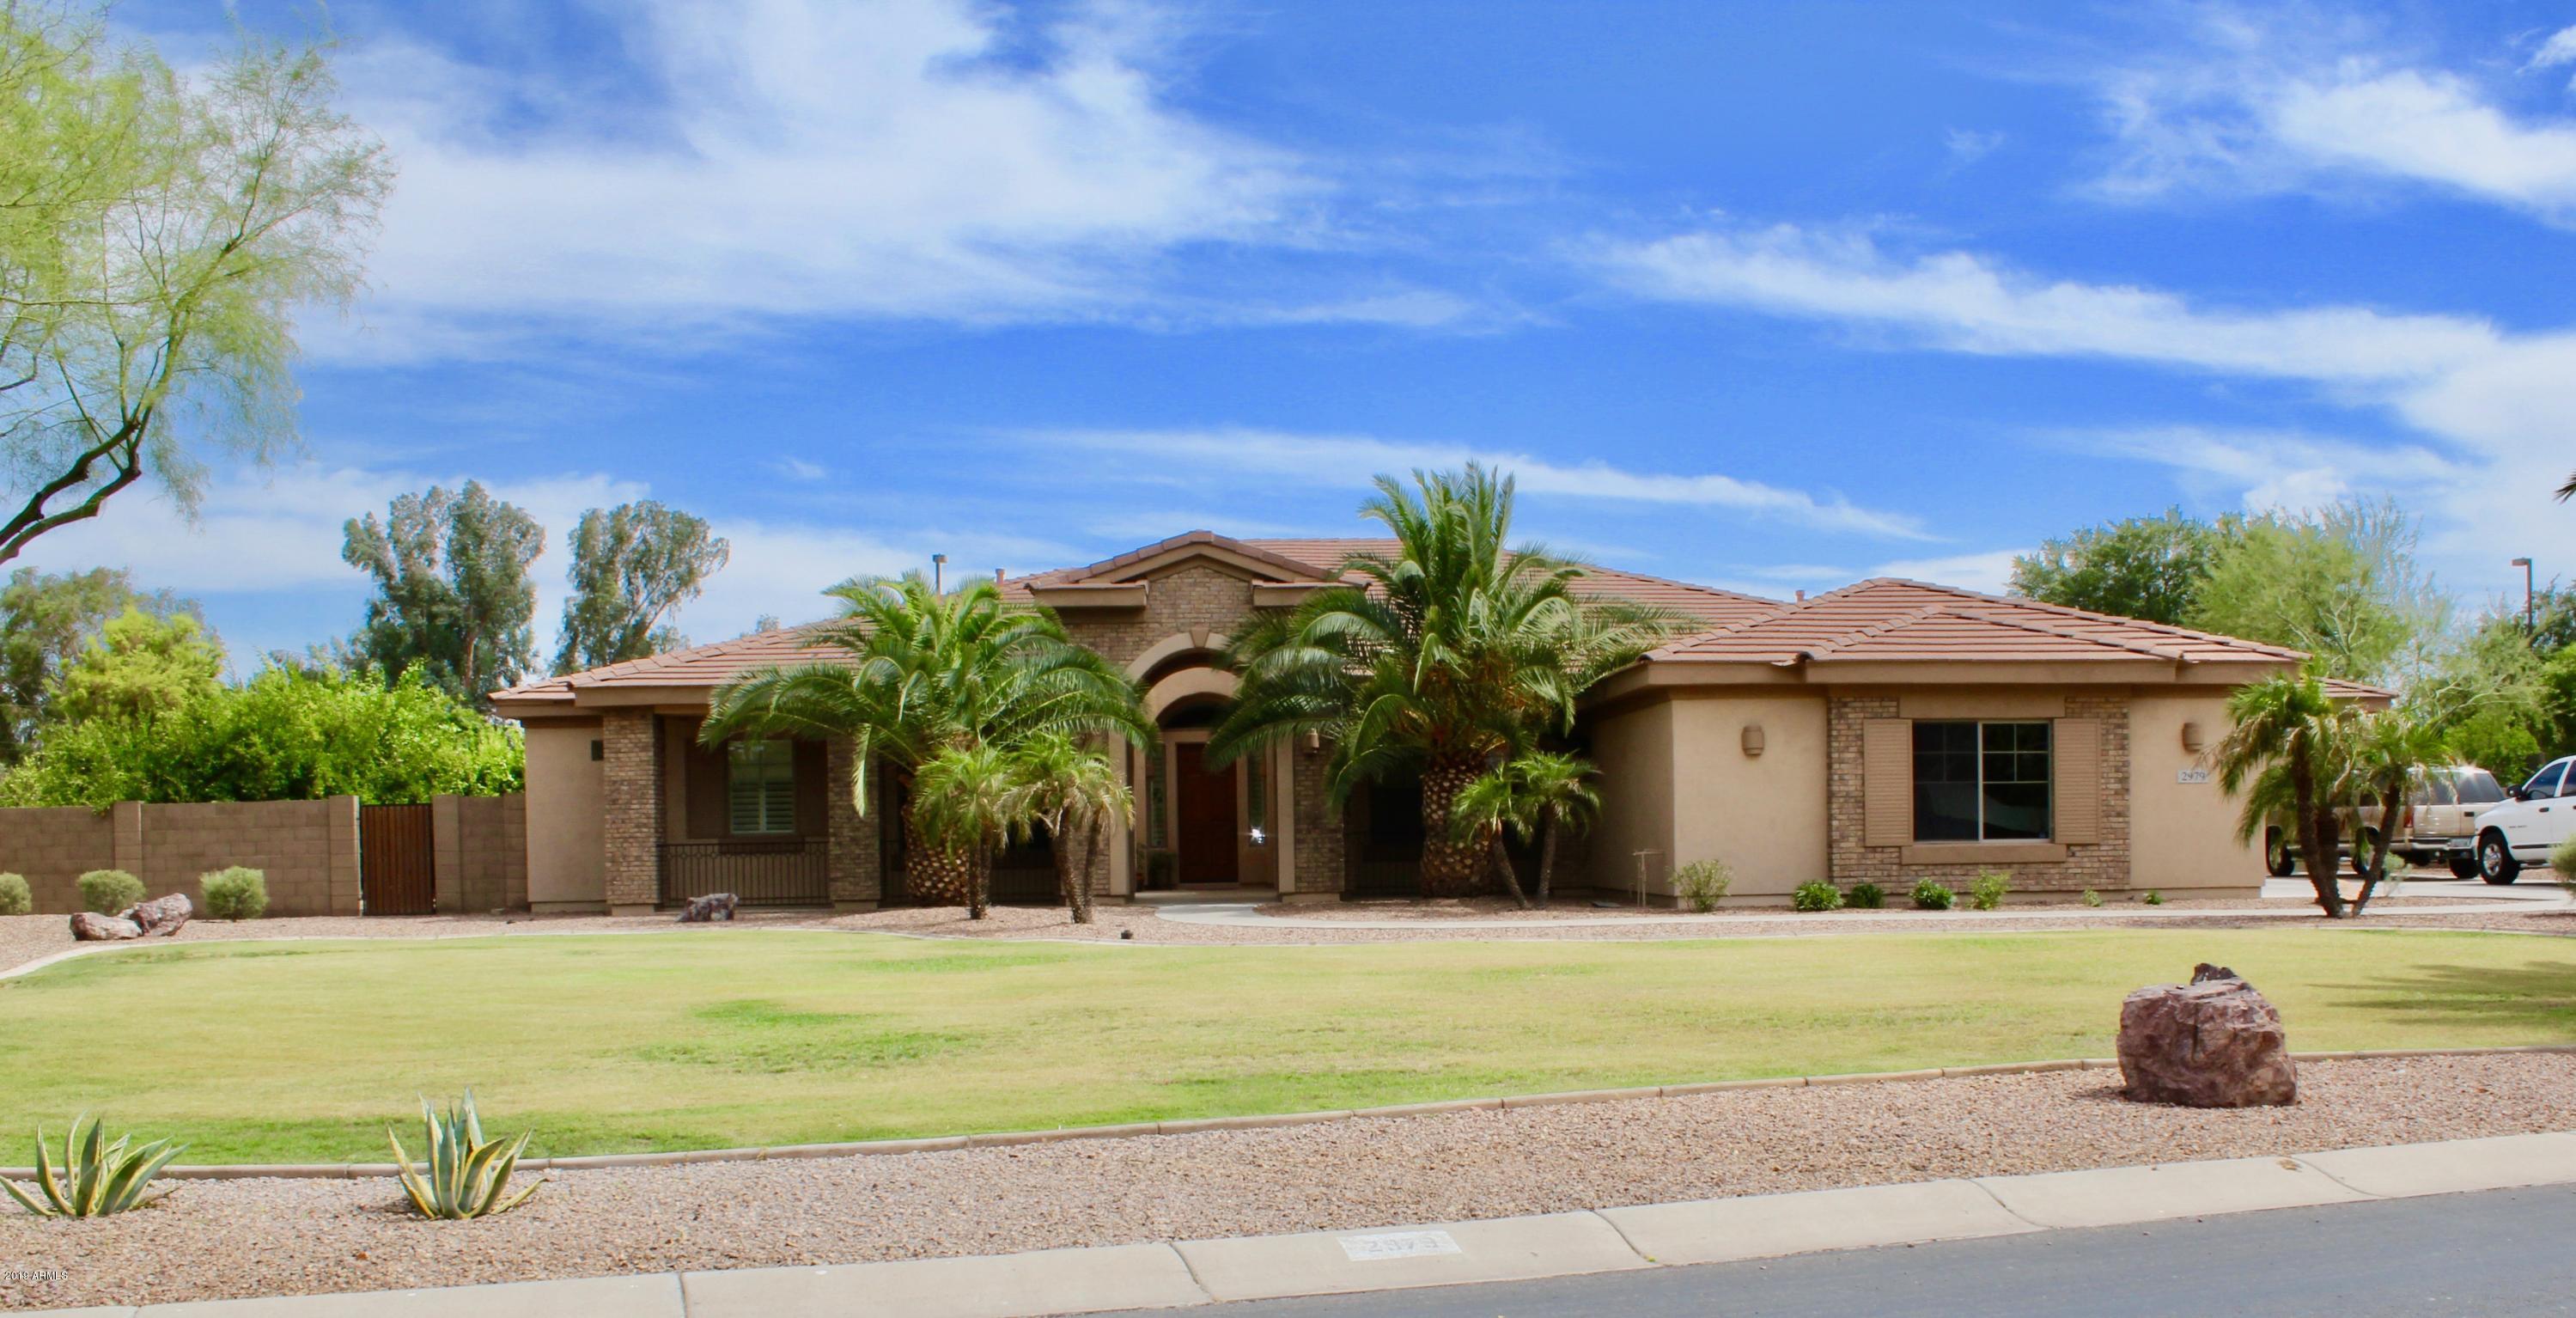 Photo of 2979 E LOWELL Avenue, Gilbert, AZ 85295